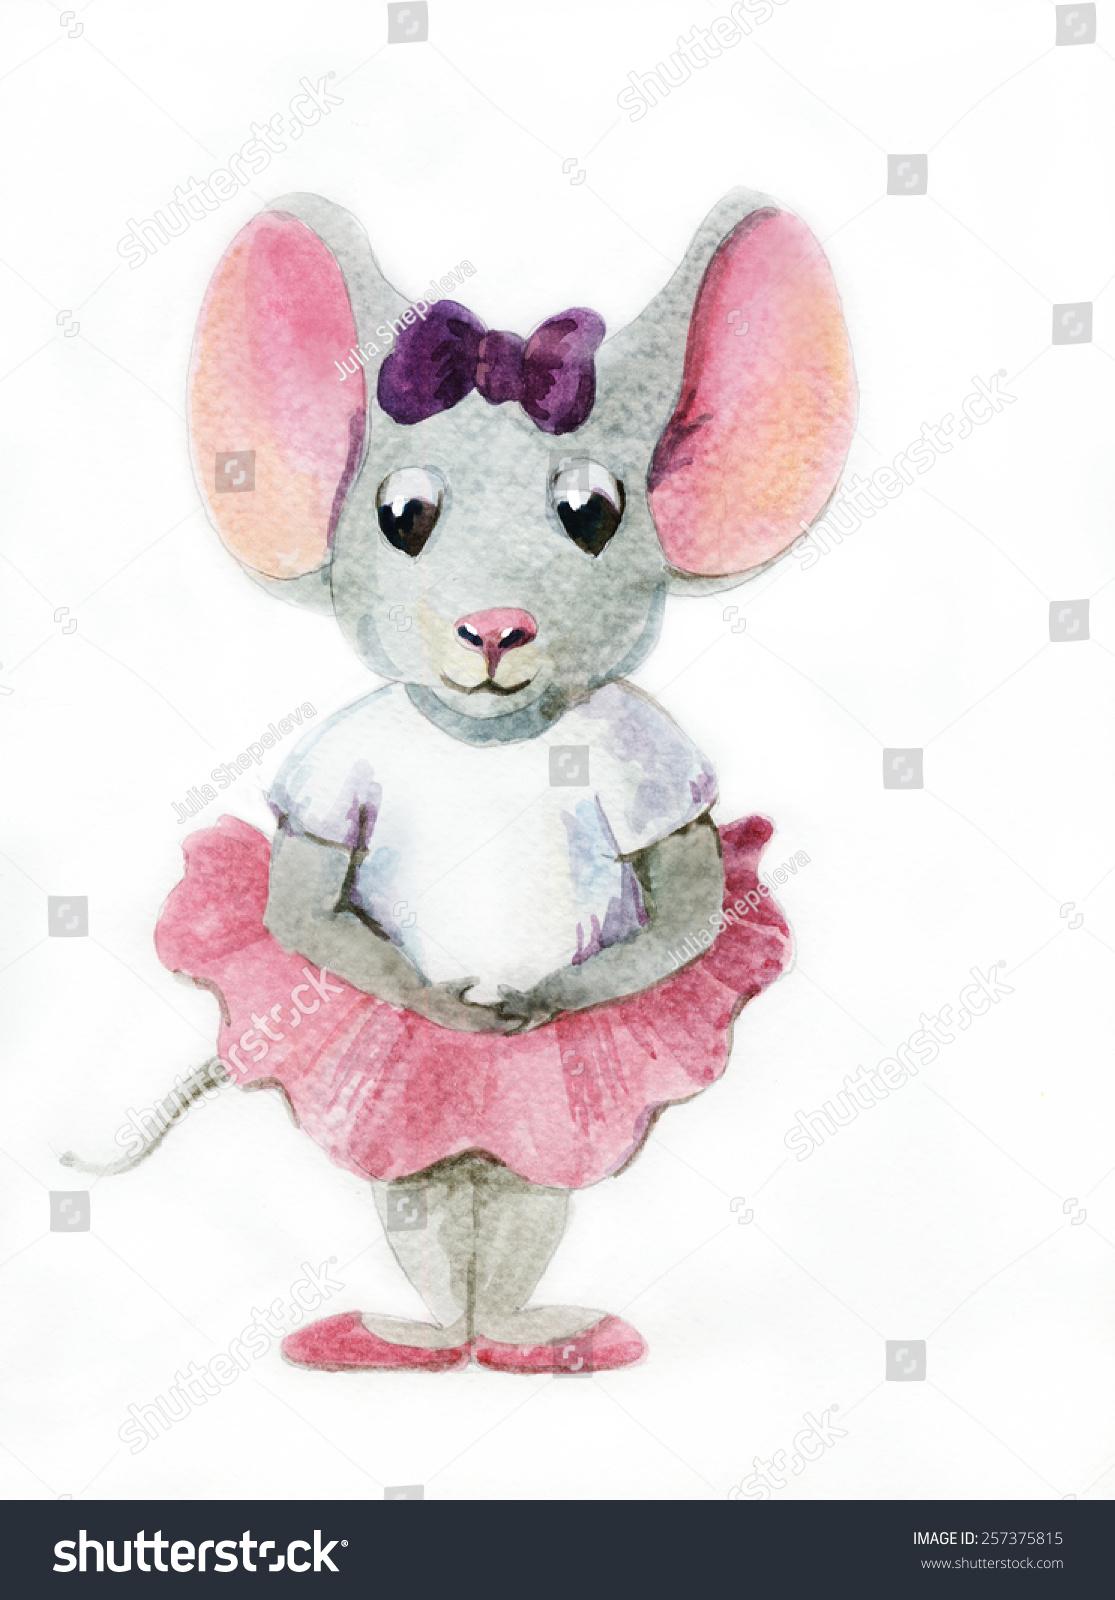 灰色mouse-ballerina水彩画